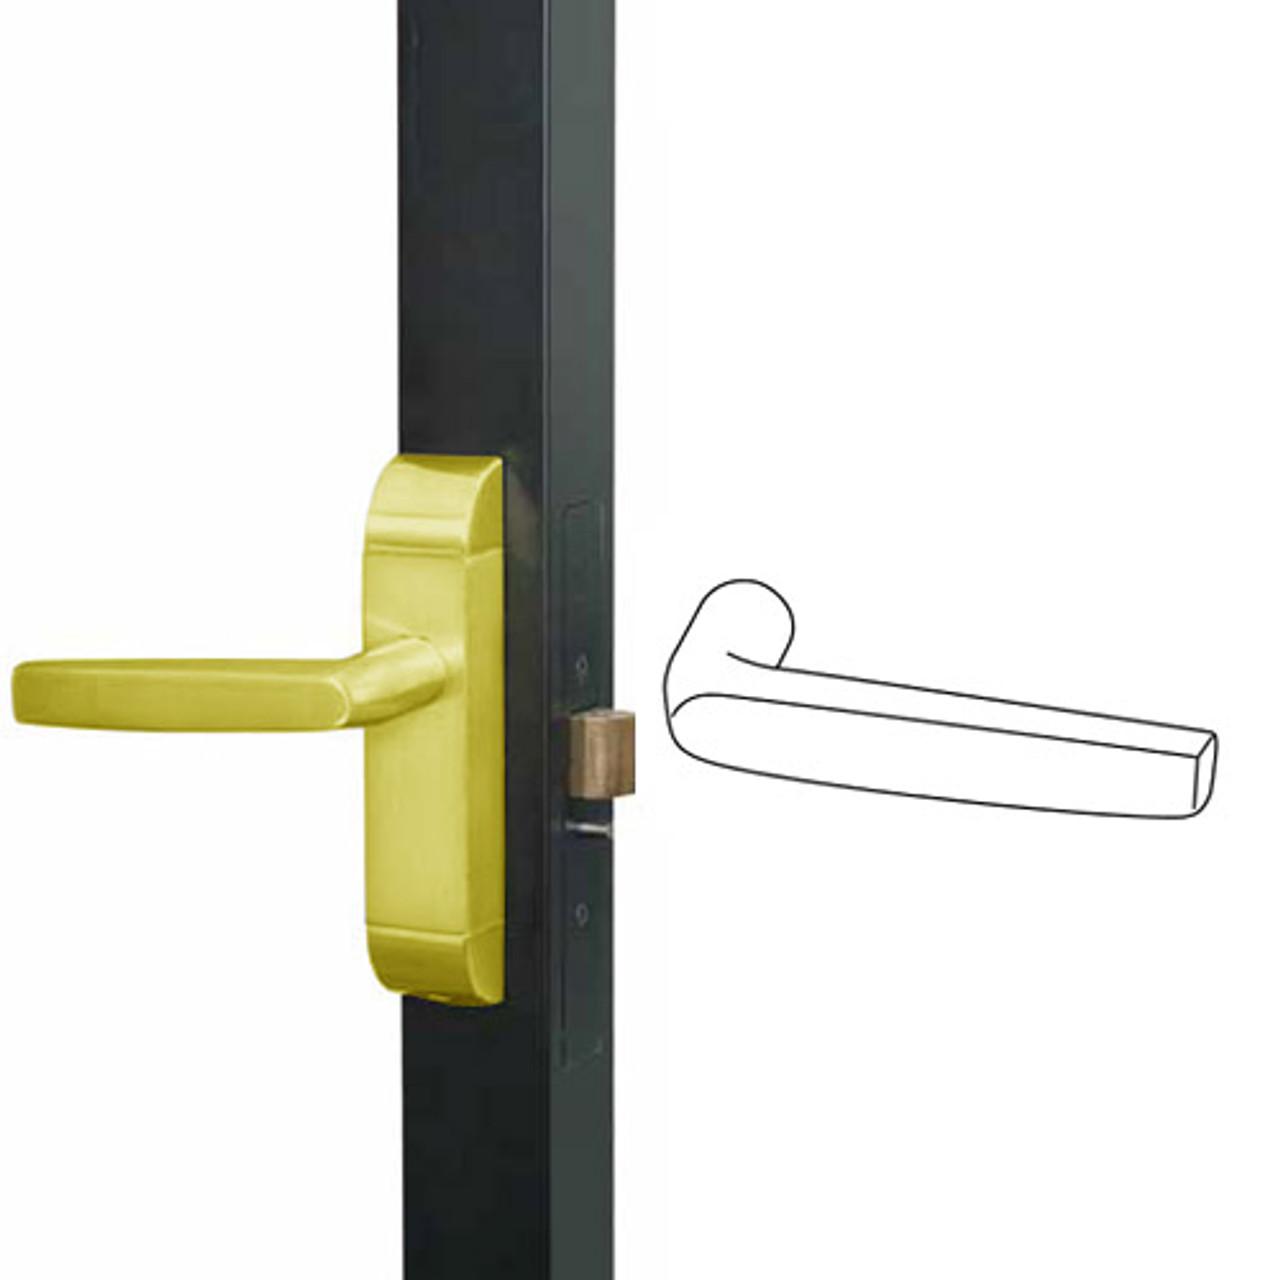 4600-MJ-632-US3 Adams Rite MJ Designer Deadlatch handle in Bright Brass Finish